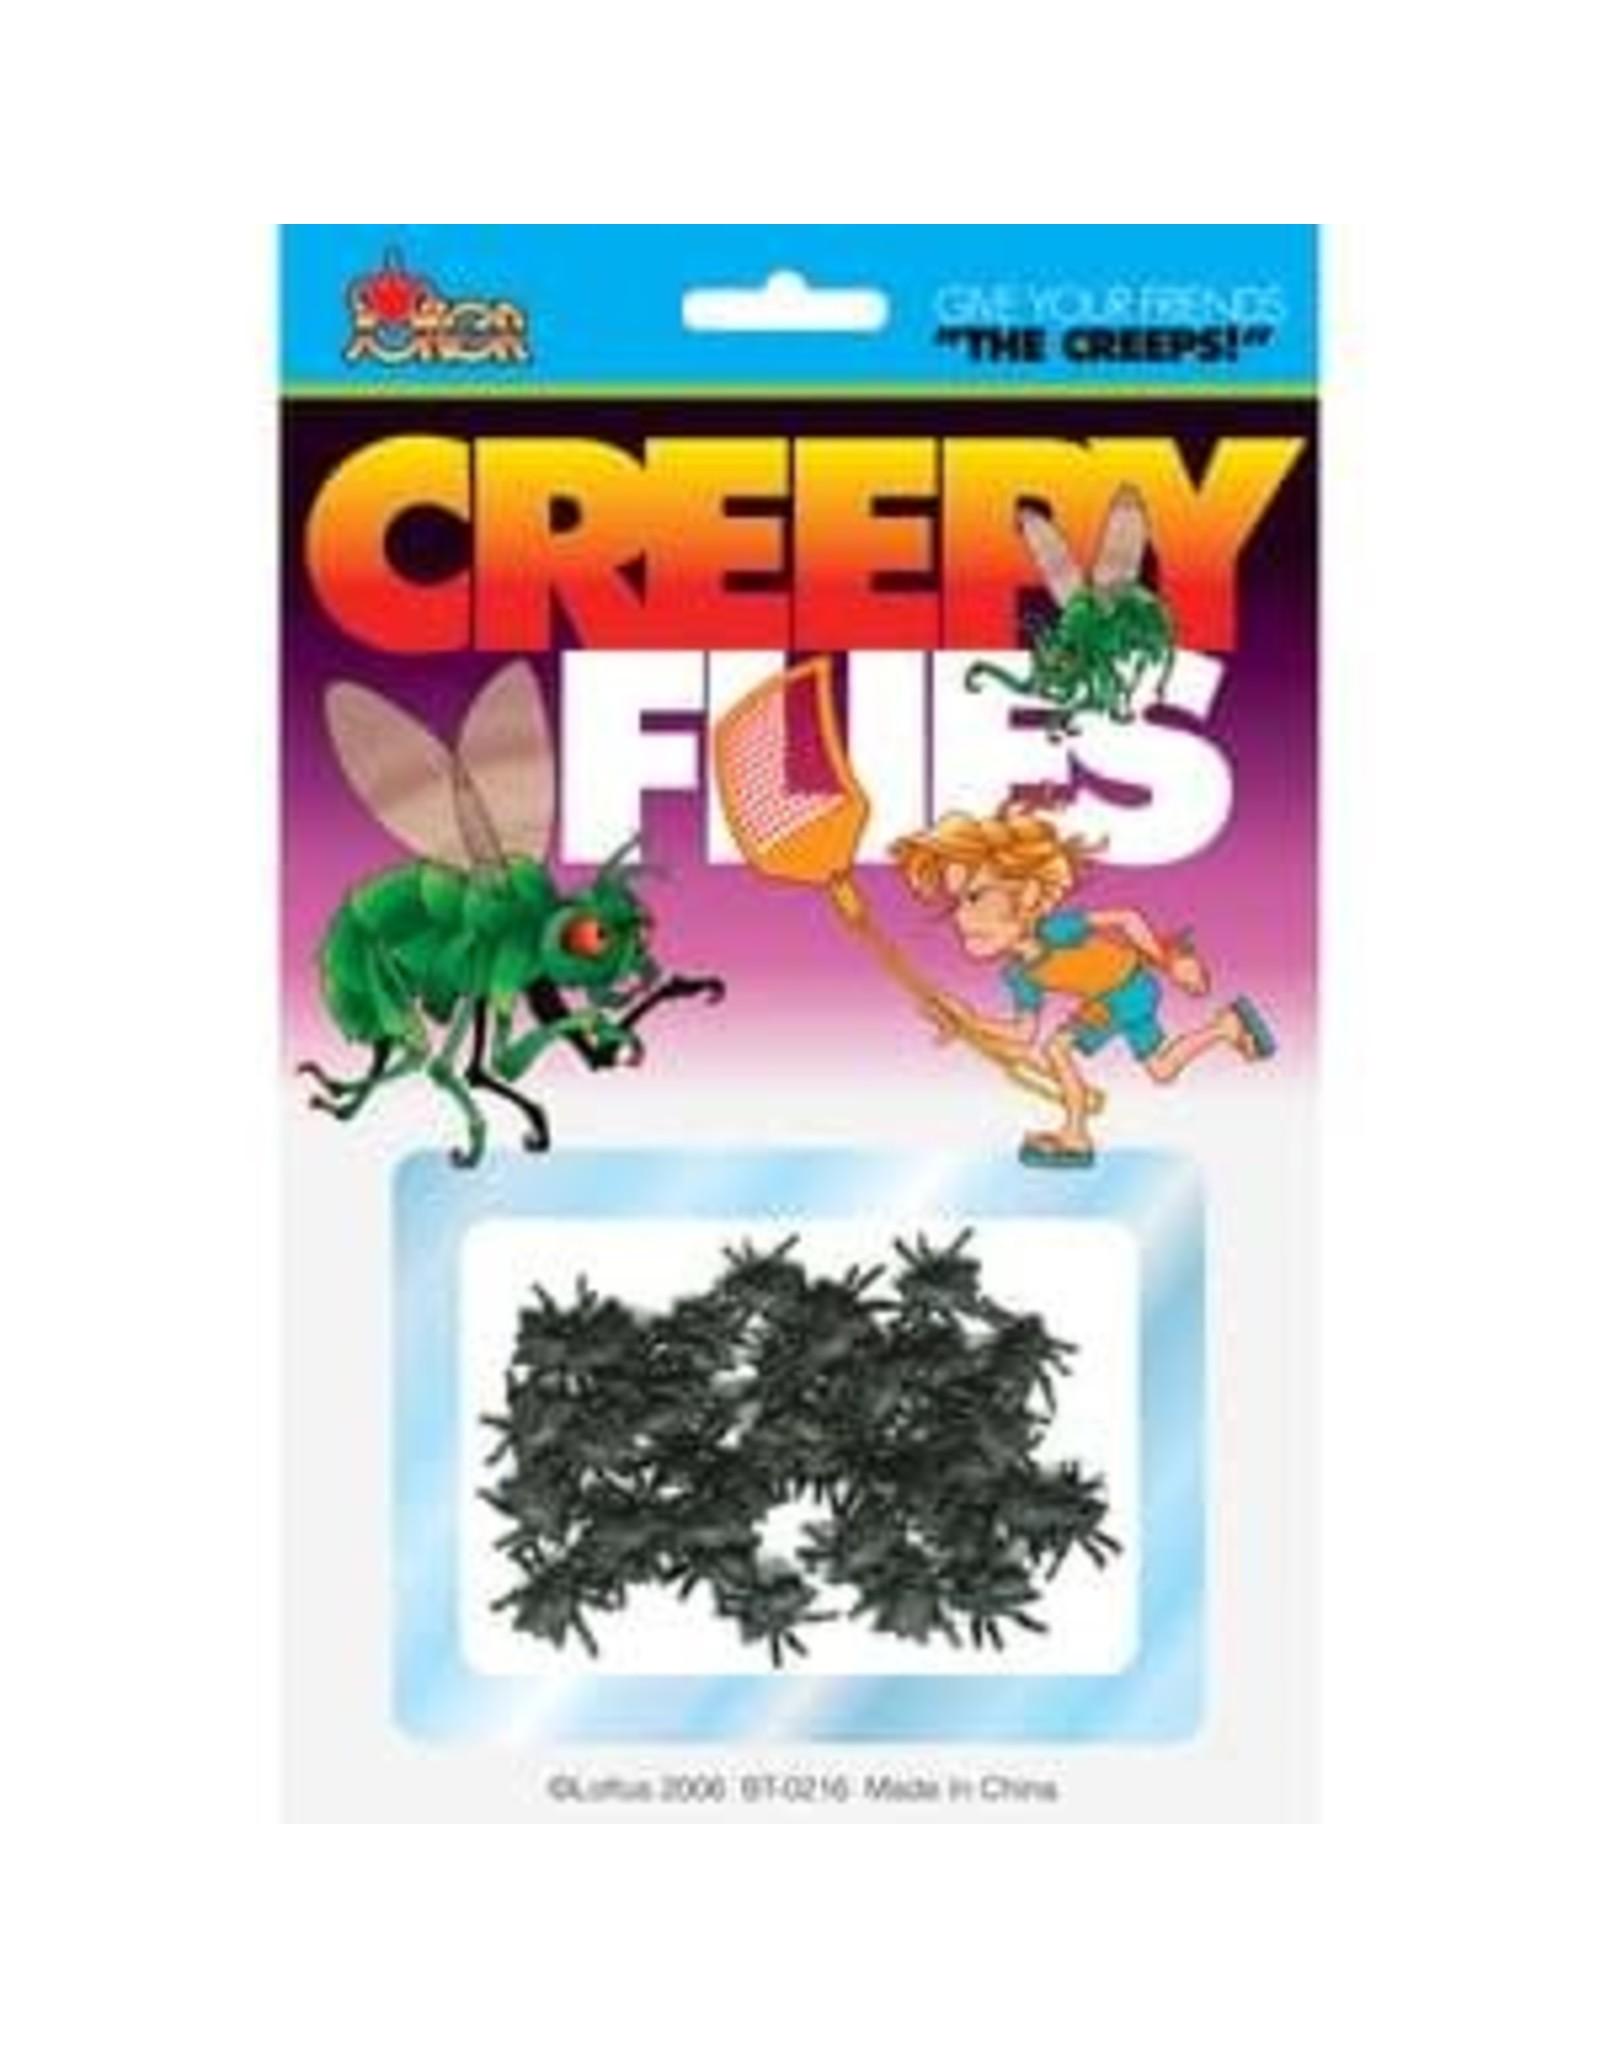 Loftus Creepy Flies